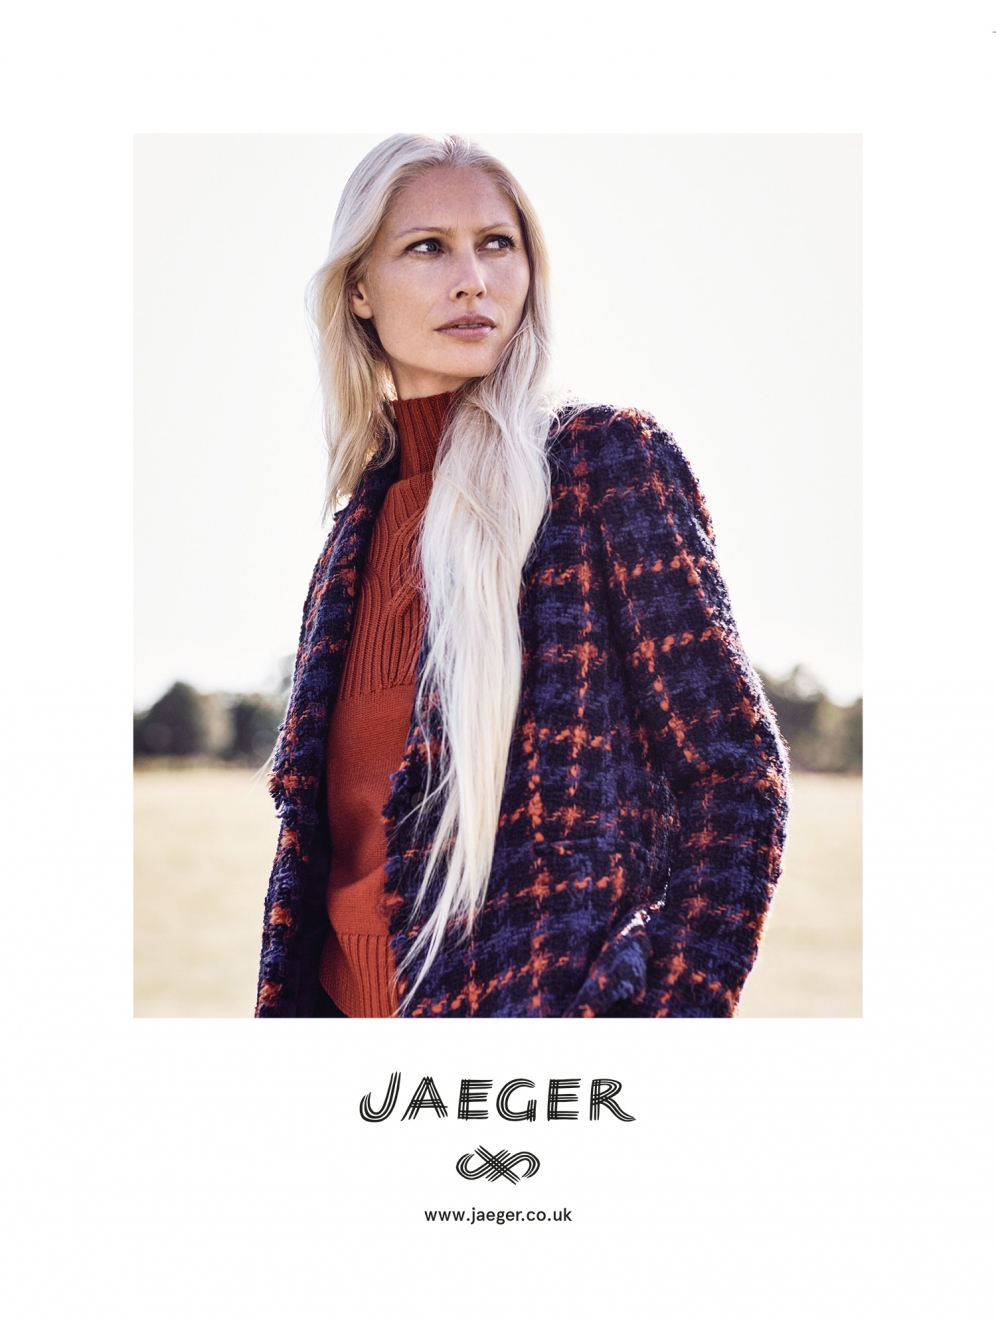 JAEGER AW18